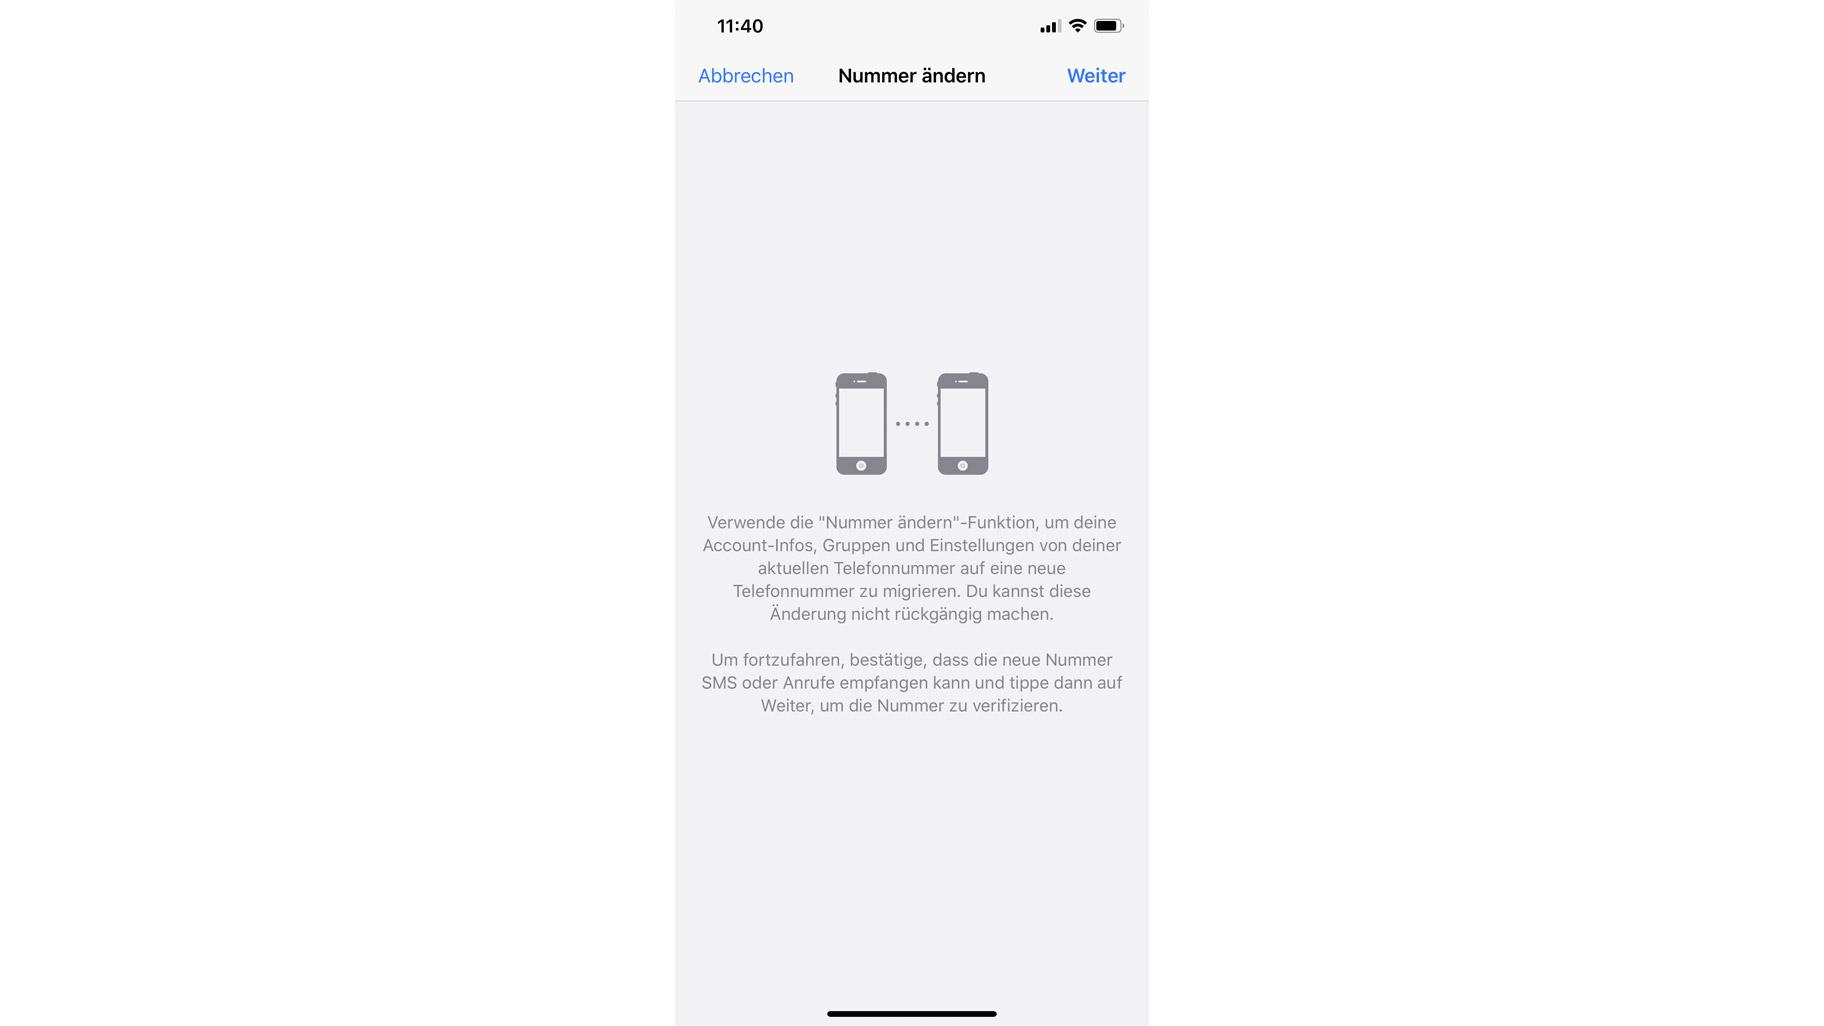 Sperre umgehen whatsapp WhatsApp: Sperrung